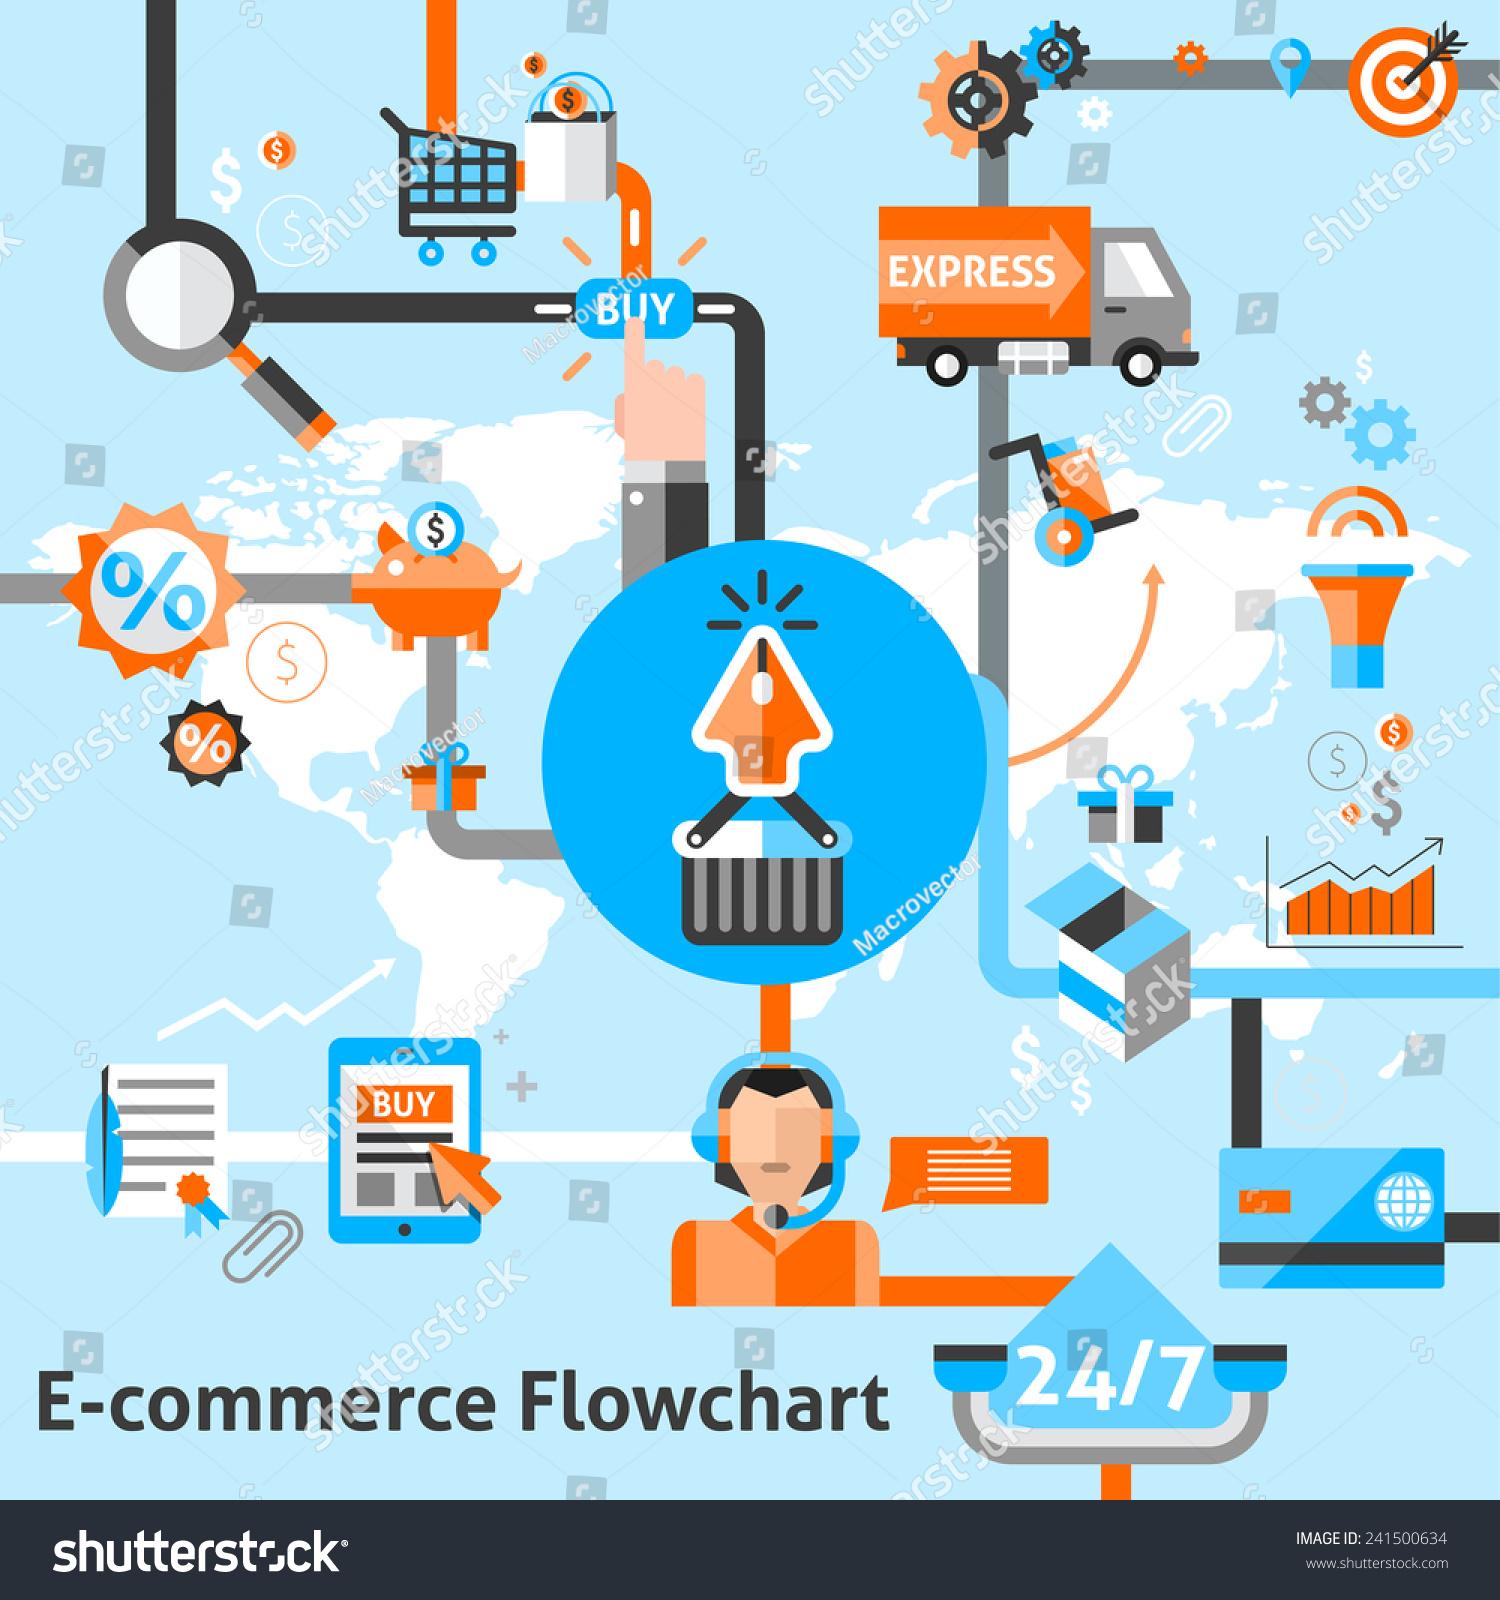 Ecommerce Flowchart Online Order Store Shipping Stock Vector ...